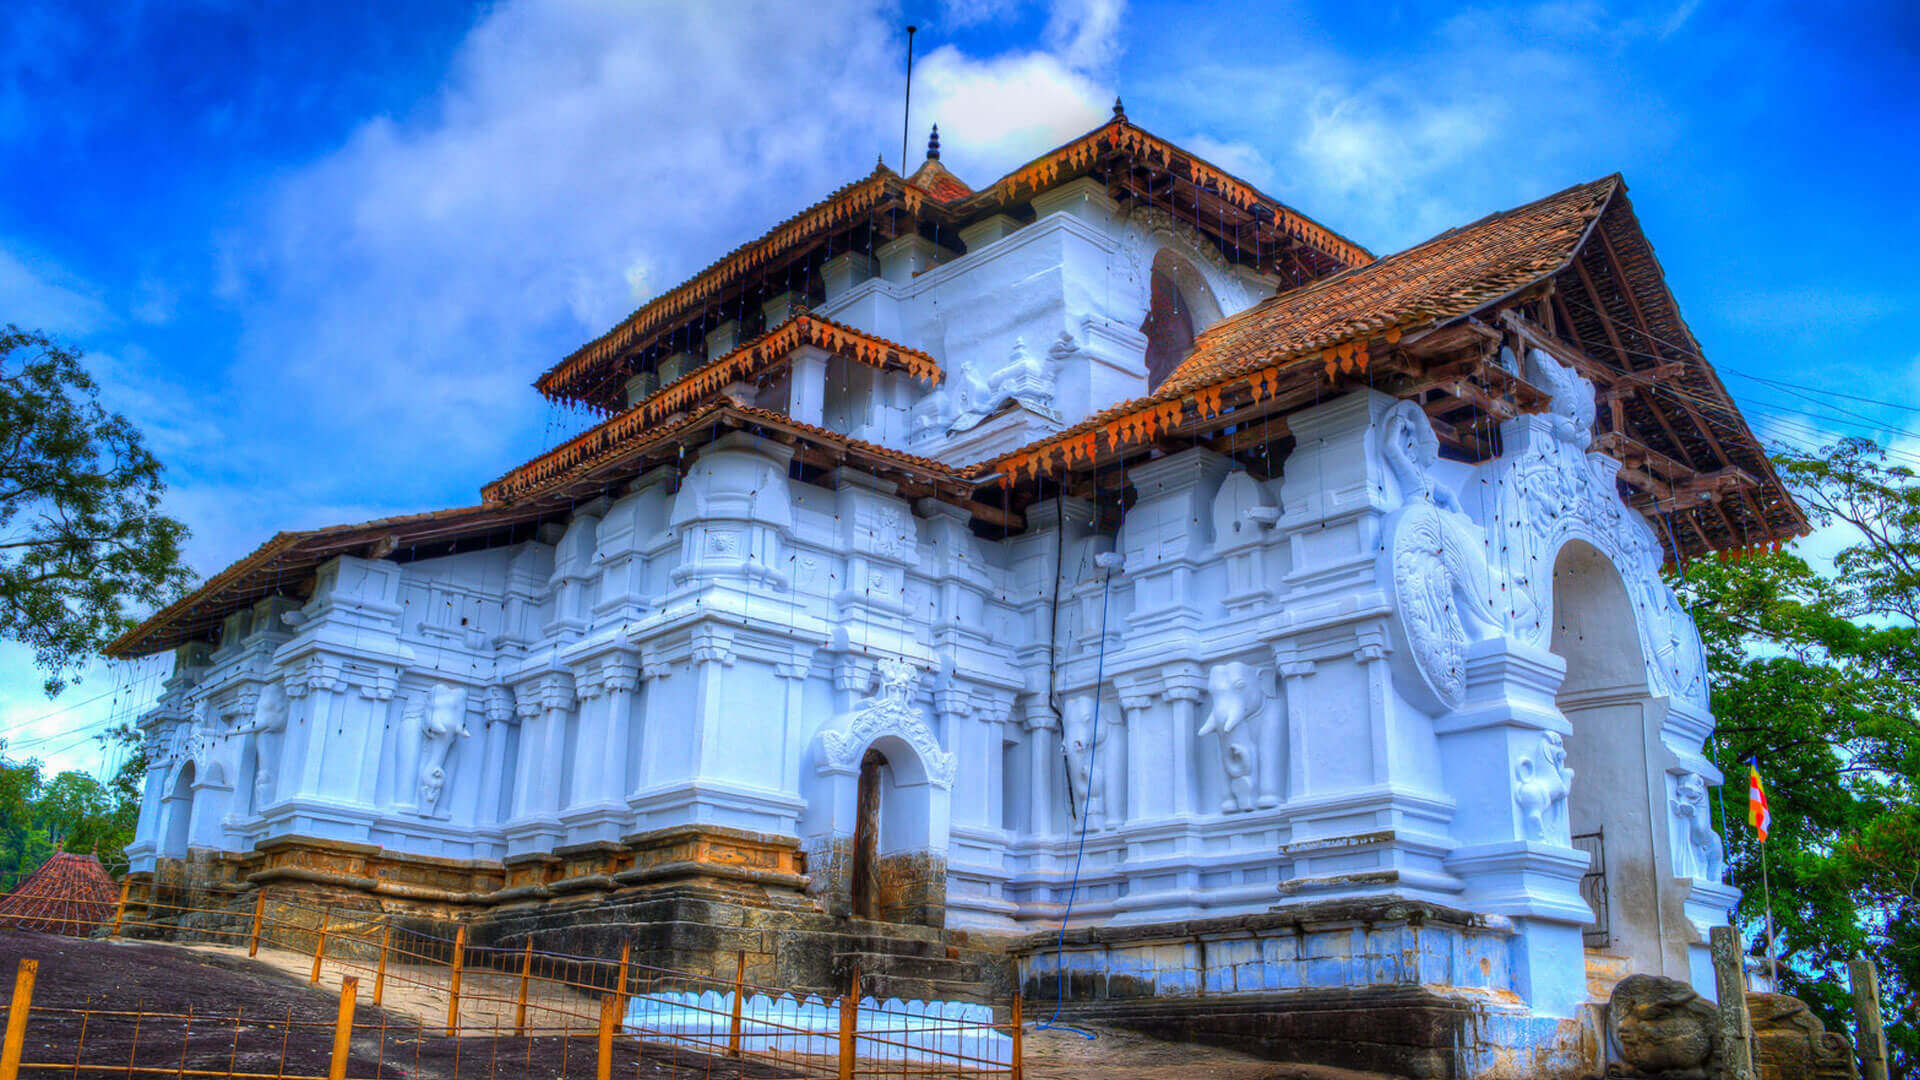 The Golden Crown - Lankathilaka Temple